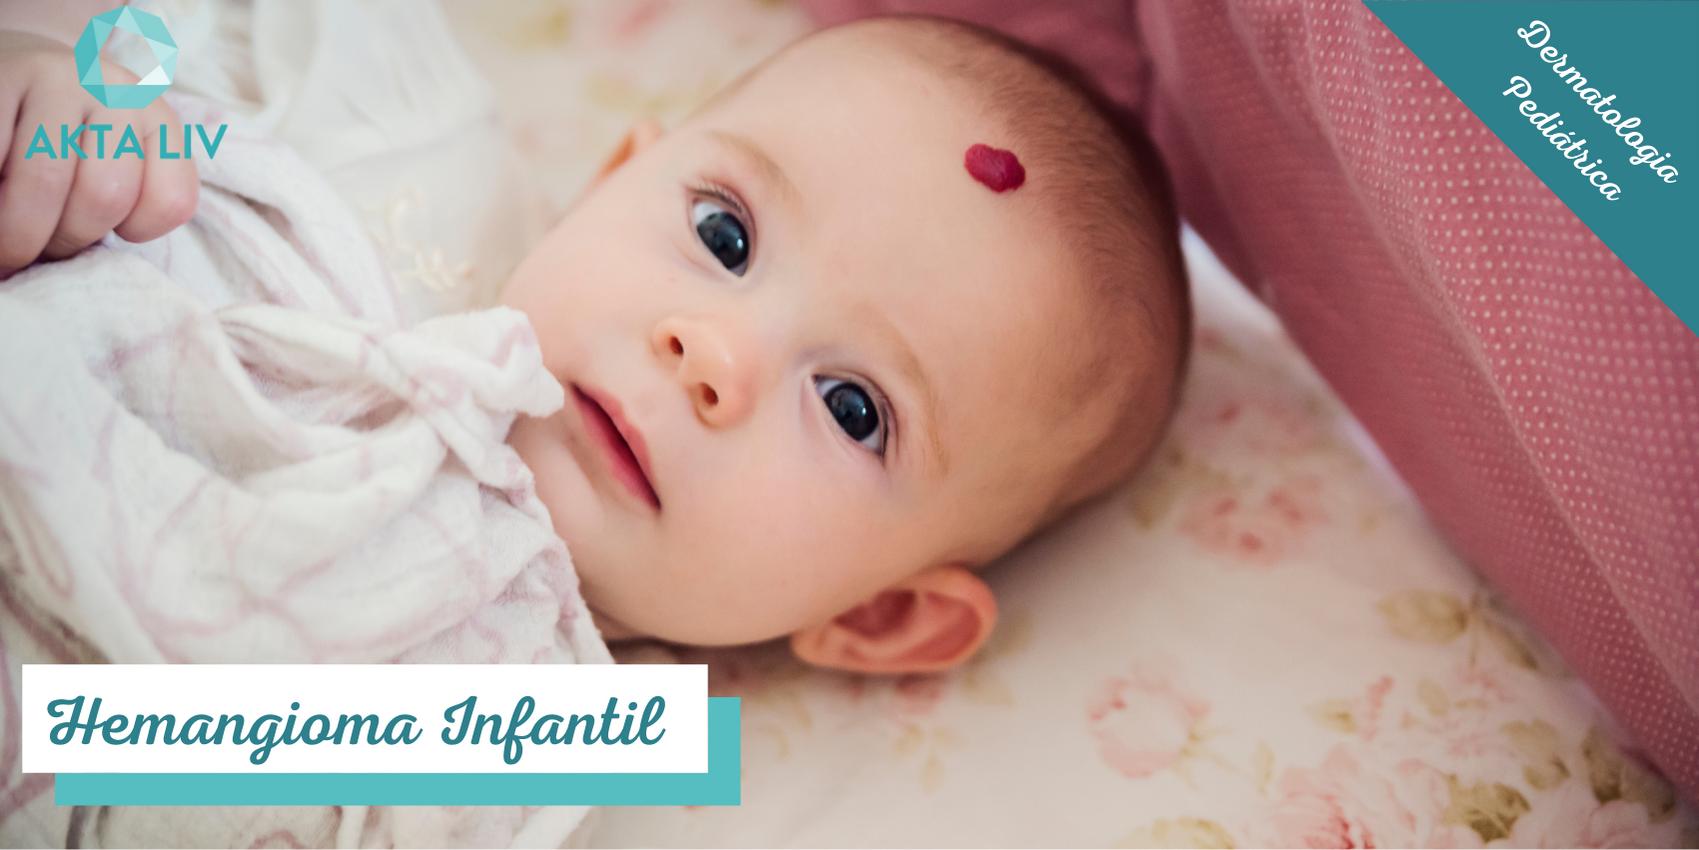 AKTA-Liv-Dermatologia-Hemangioma-Infantil